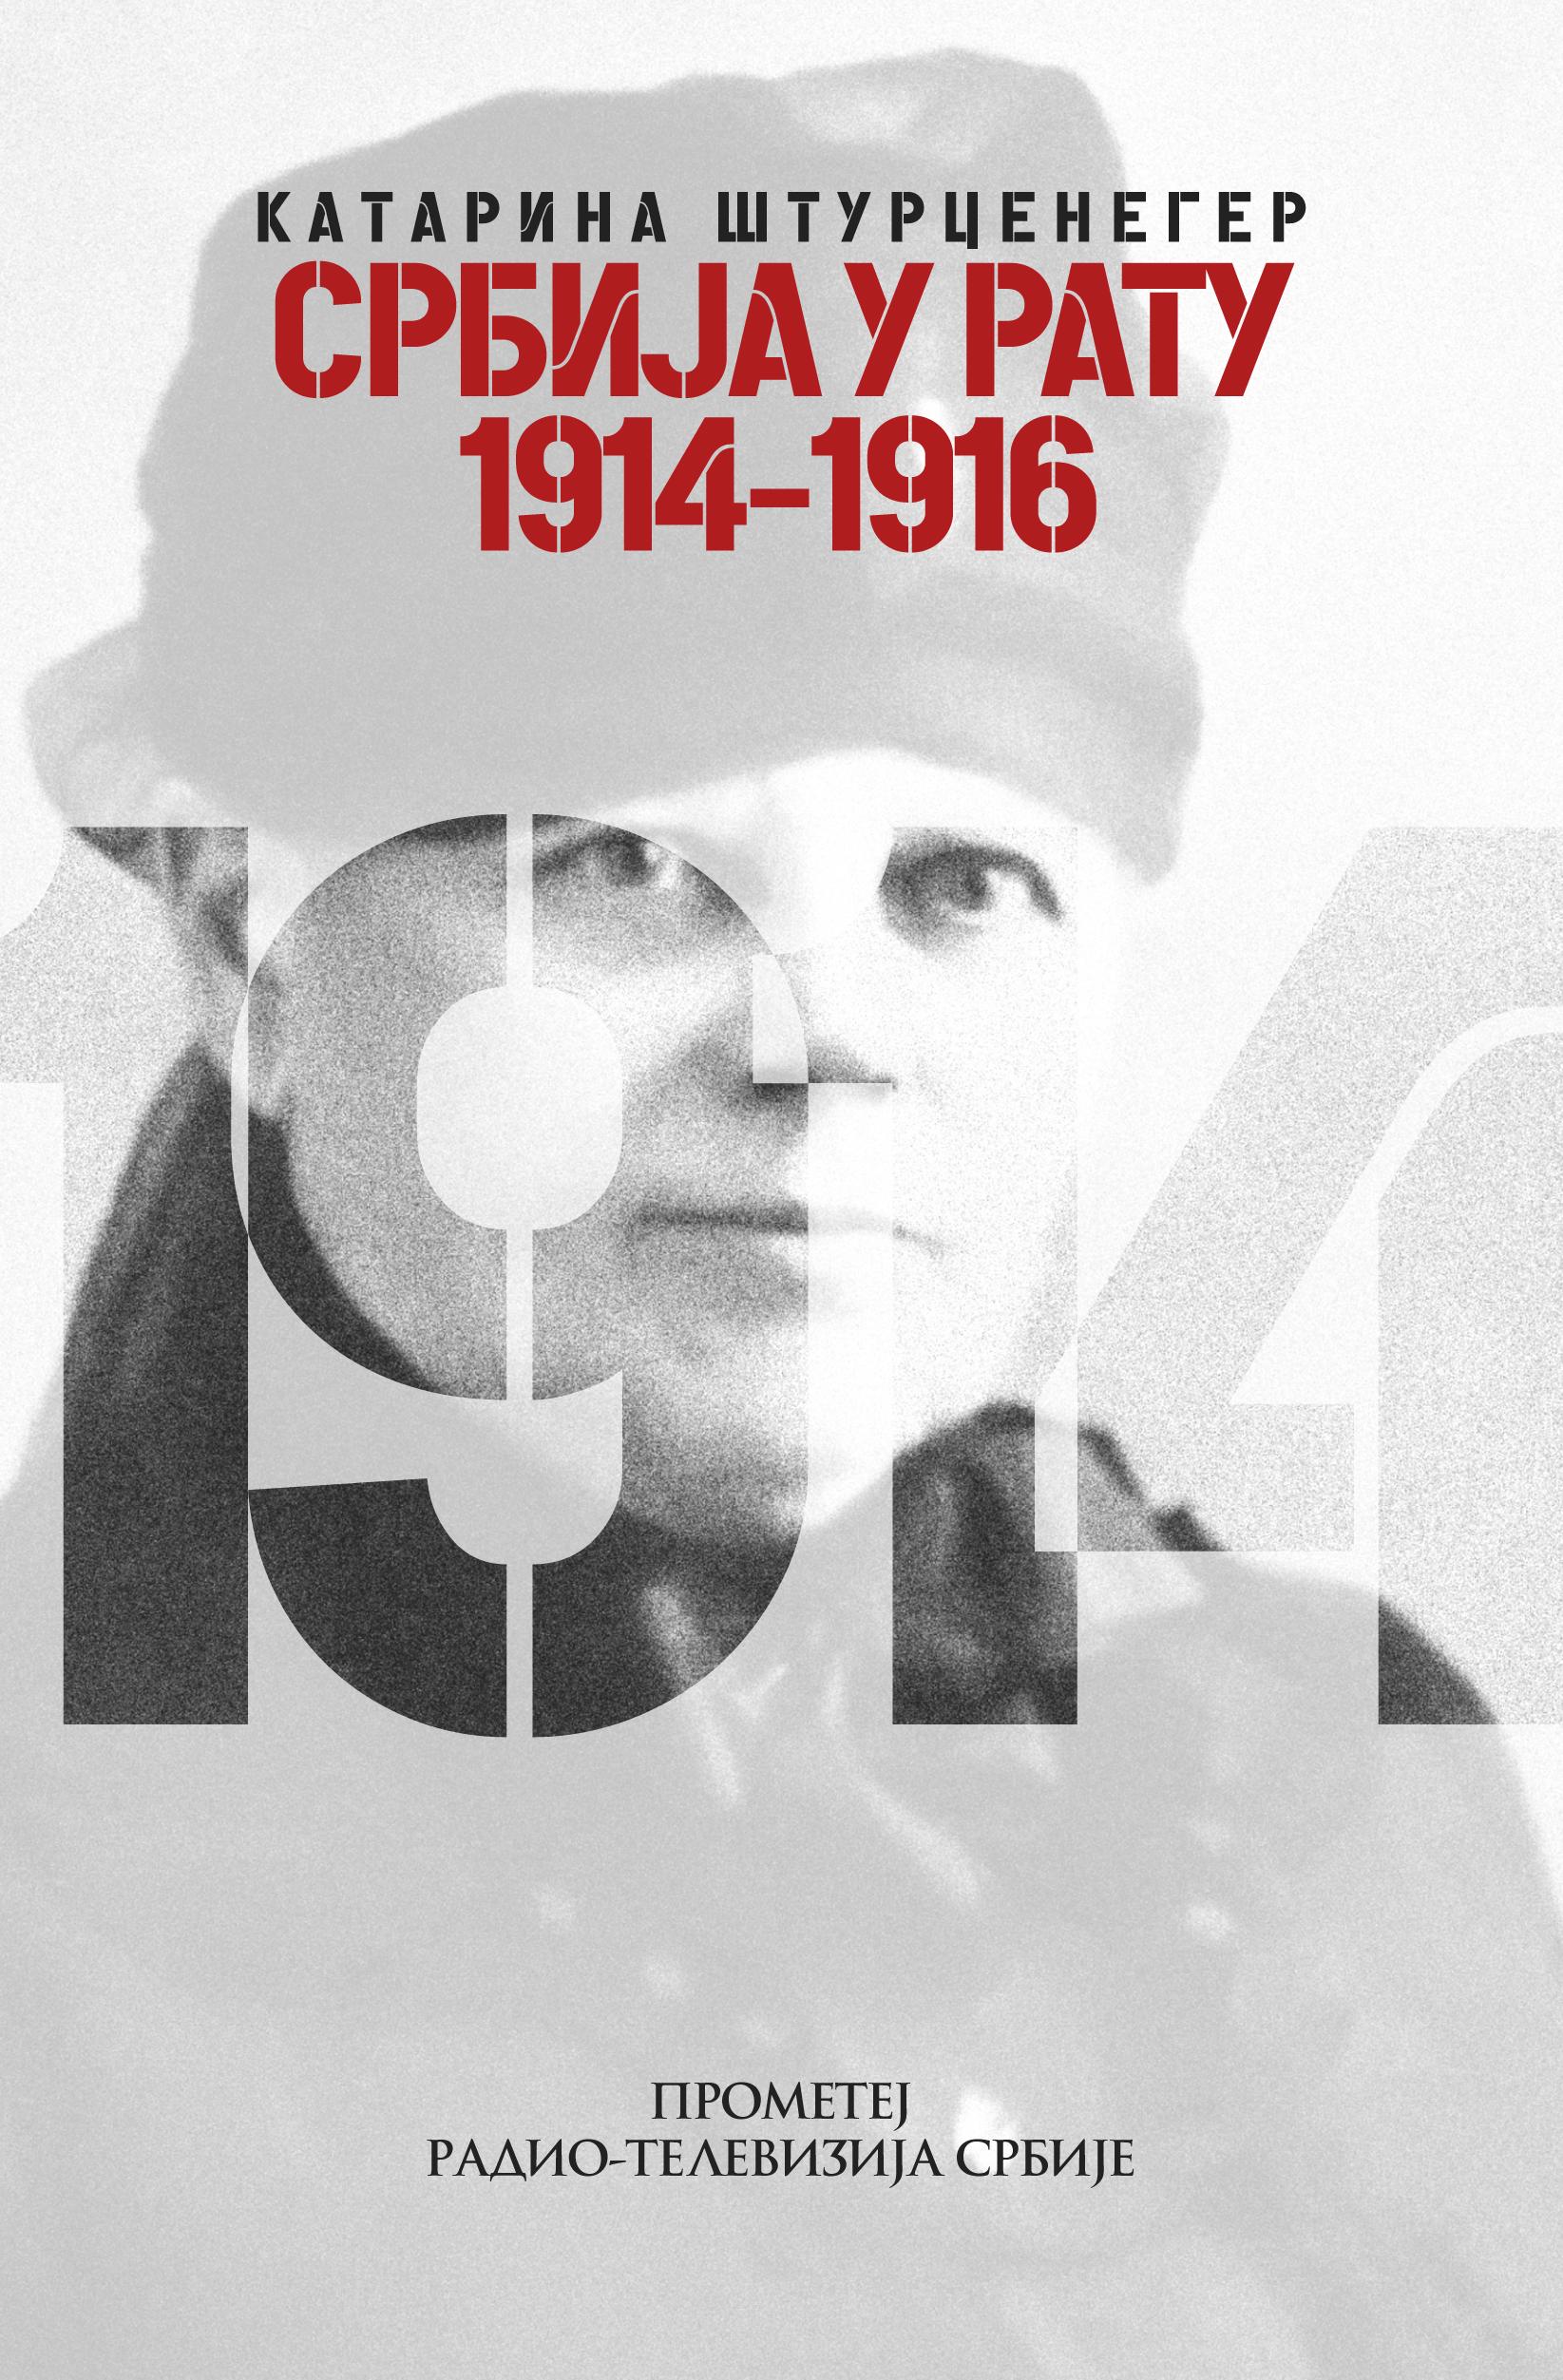 Srbija u ratu 1914-1916